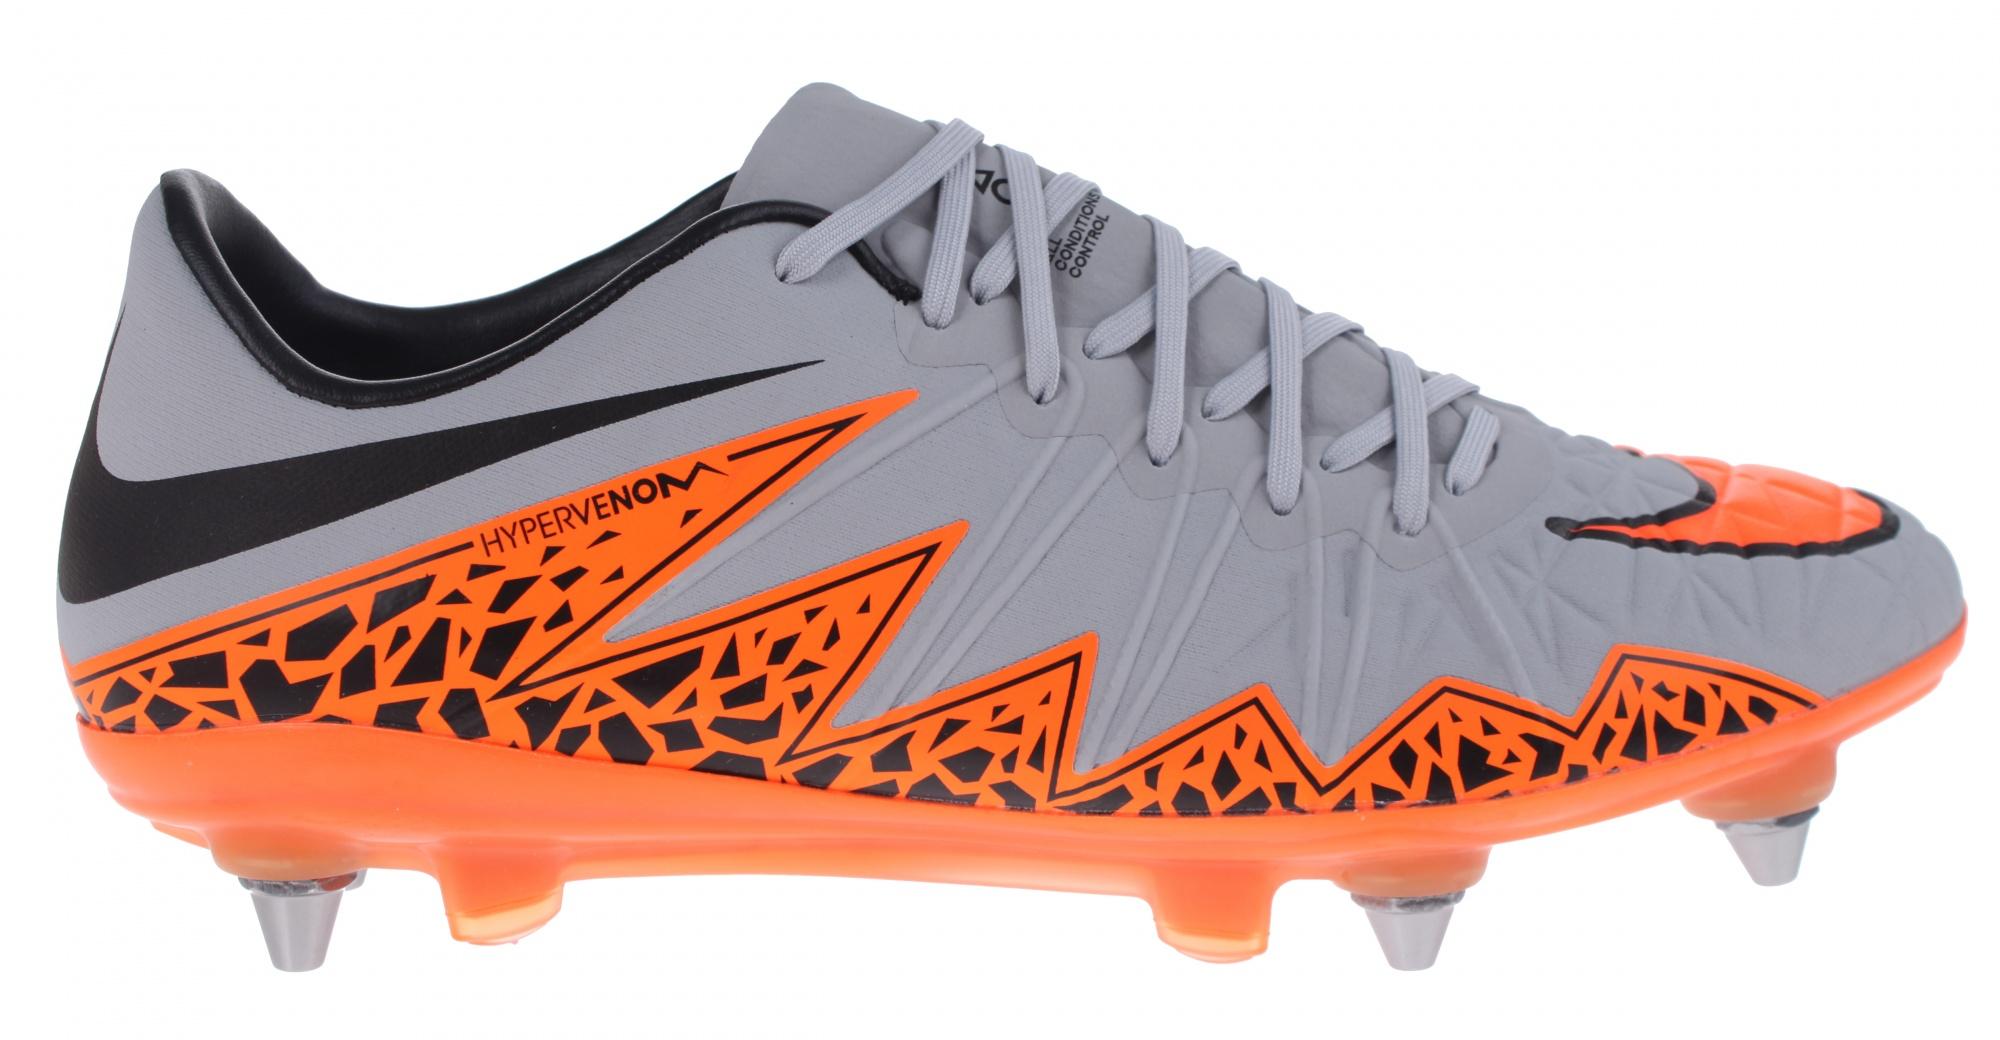 b267161d76d0 Nike soccer Hypervenom Phinish SG-Pro gray men - Internet-Sport Casuals